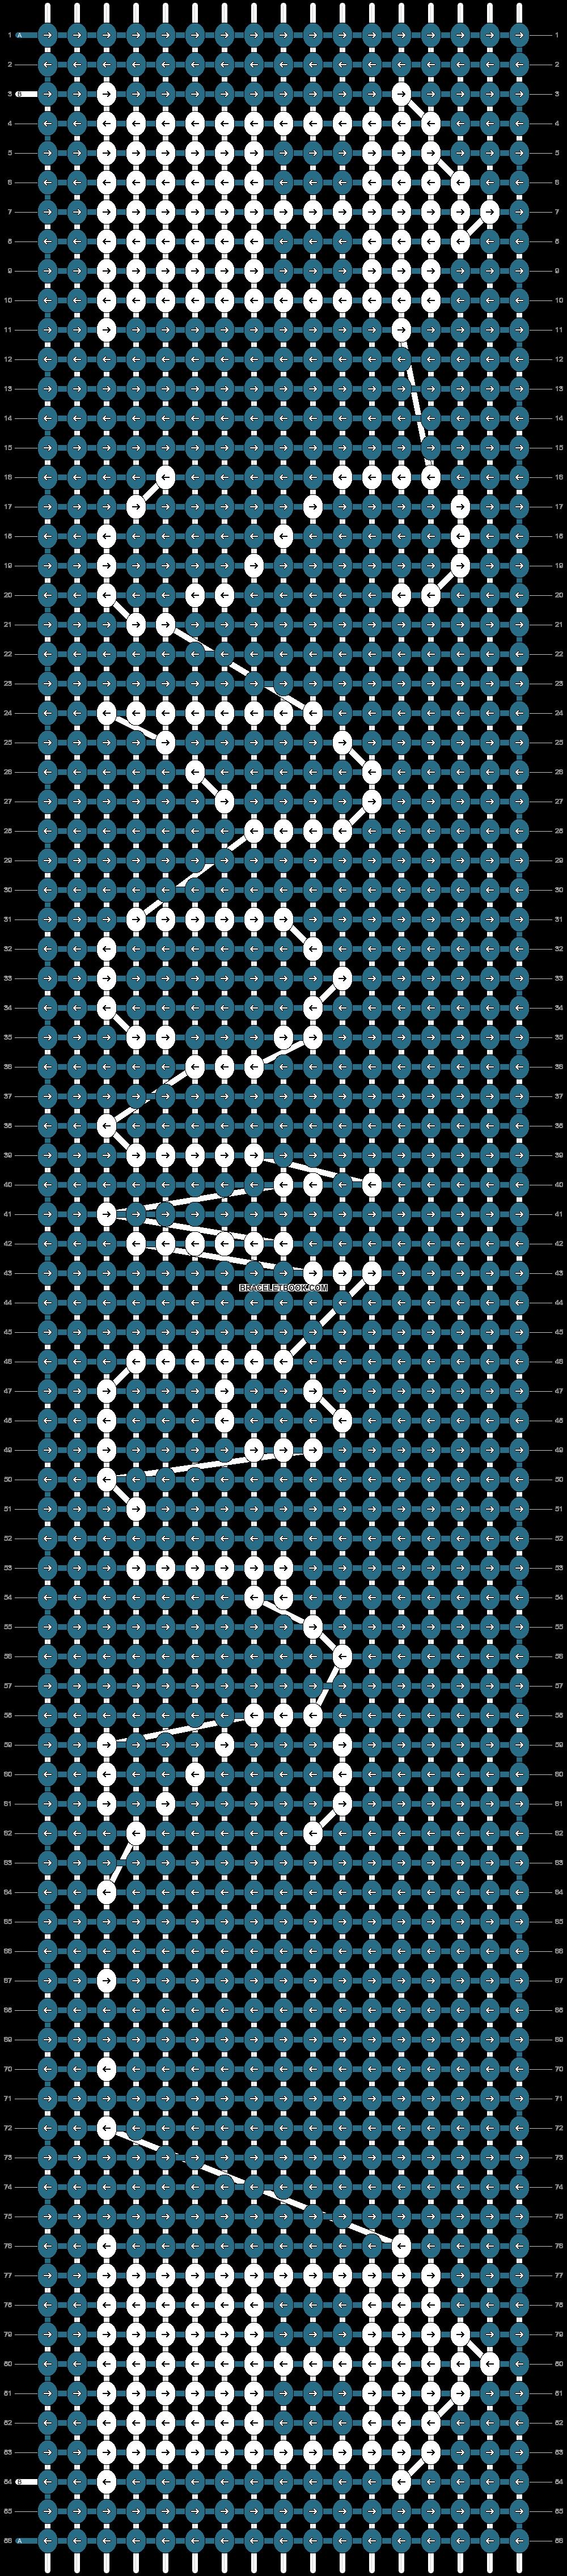 Alpha pattern #14993 pattern